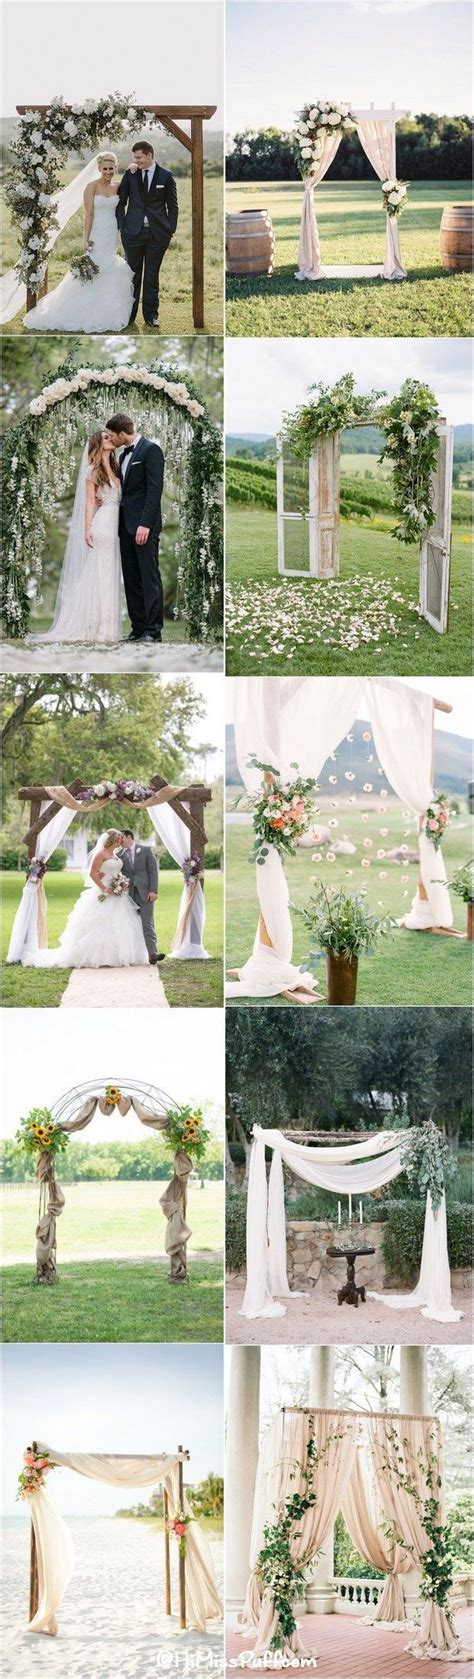 Wedding Arch Rental Seattle by Best 25 Wedding Arch Rental Ideas On Outdoor